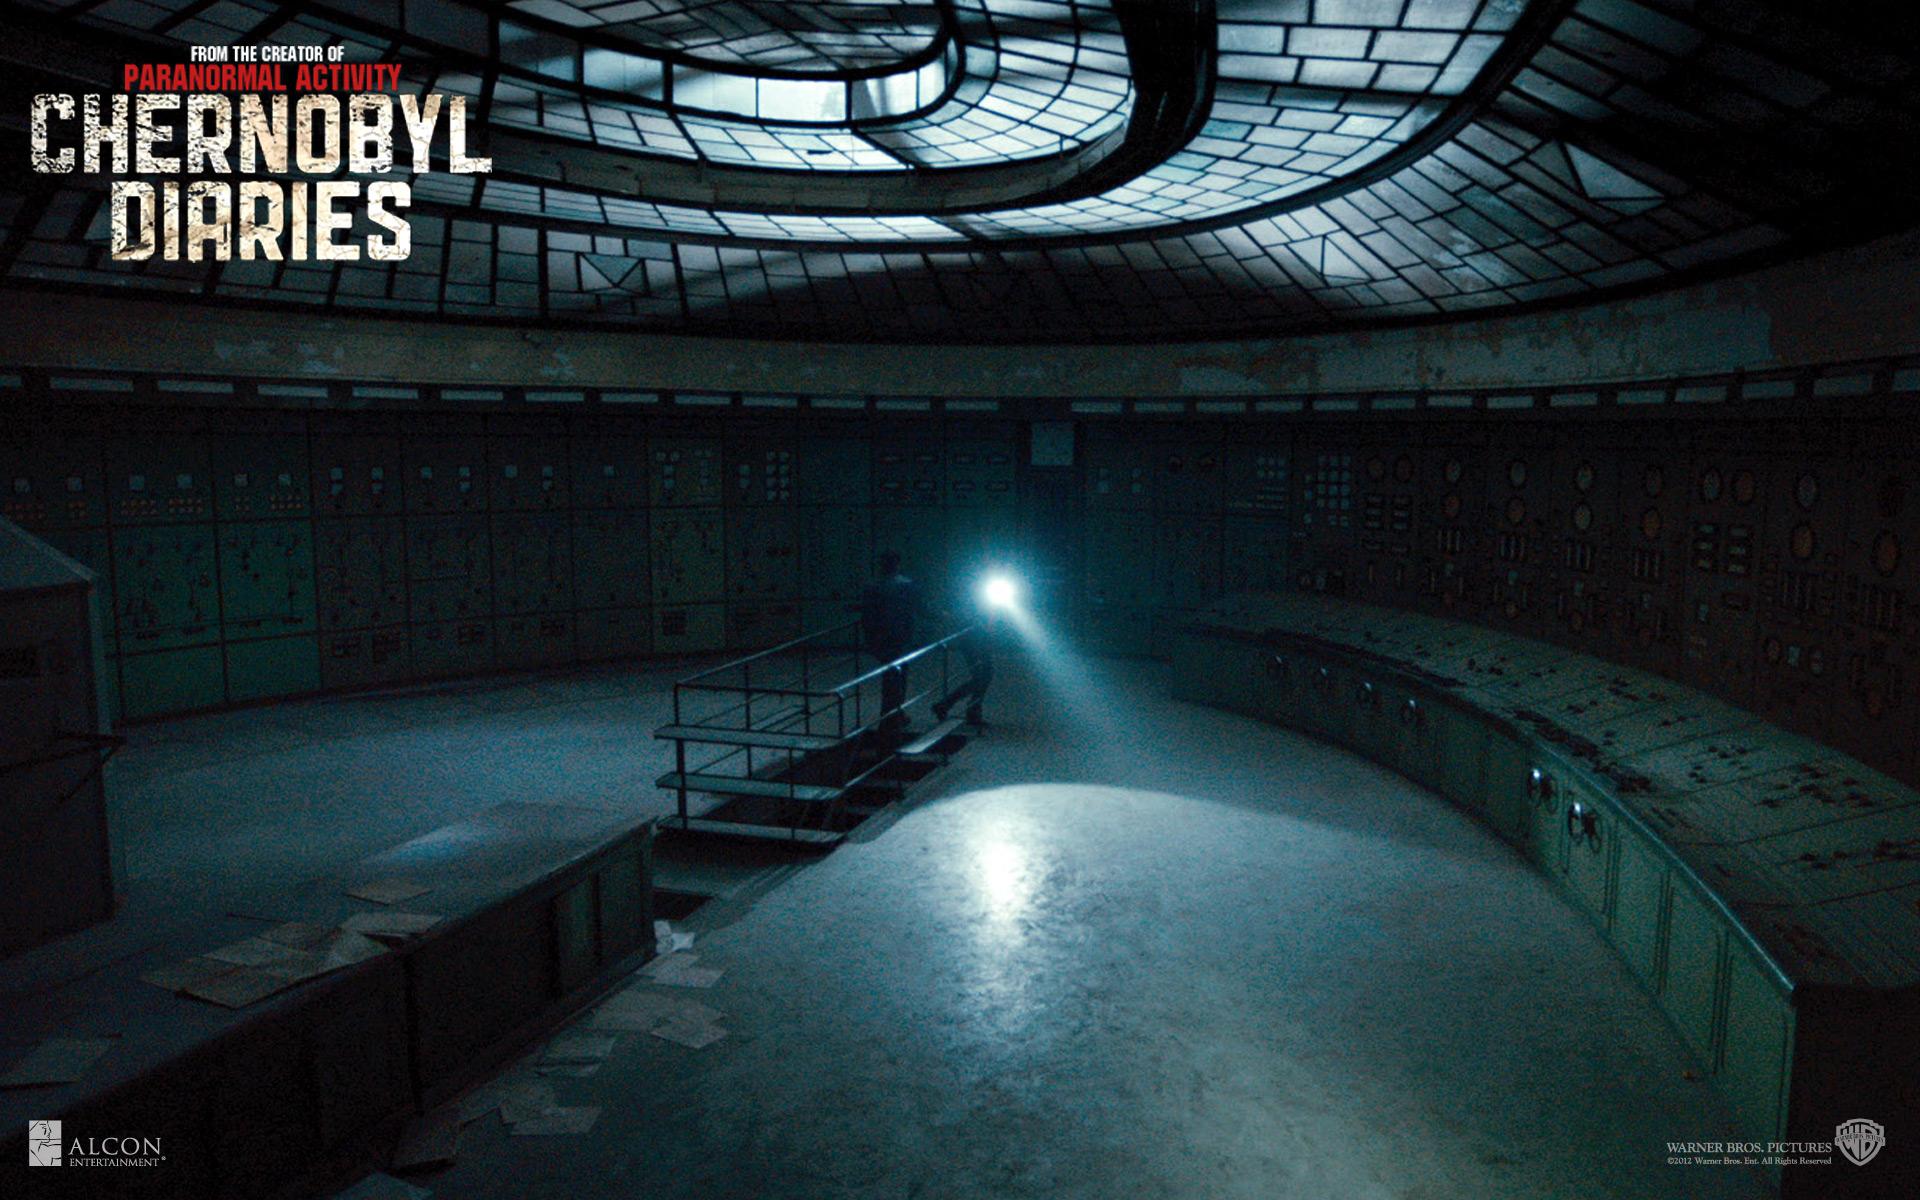 Chernobyl Diaries wallpaper 1